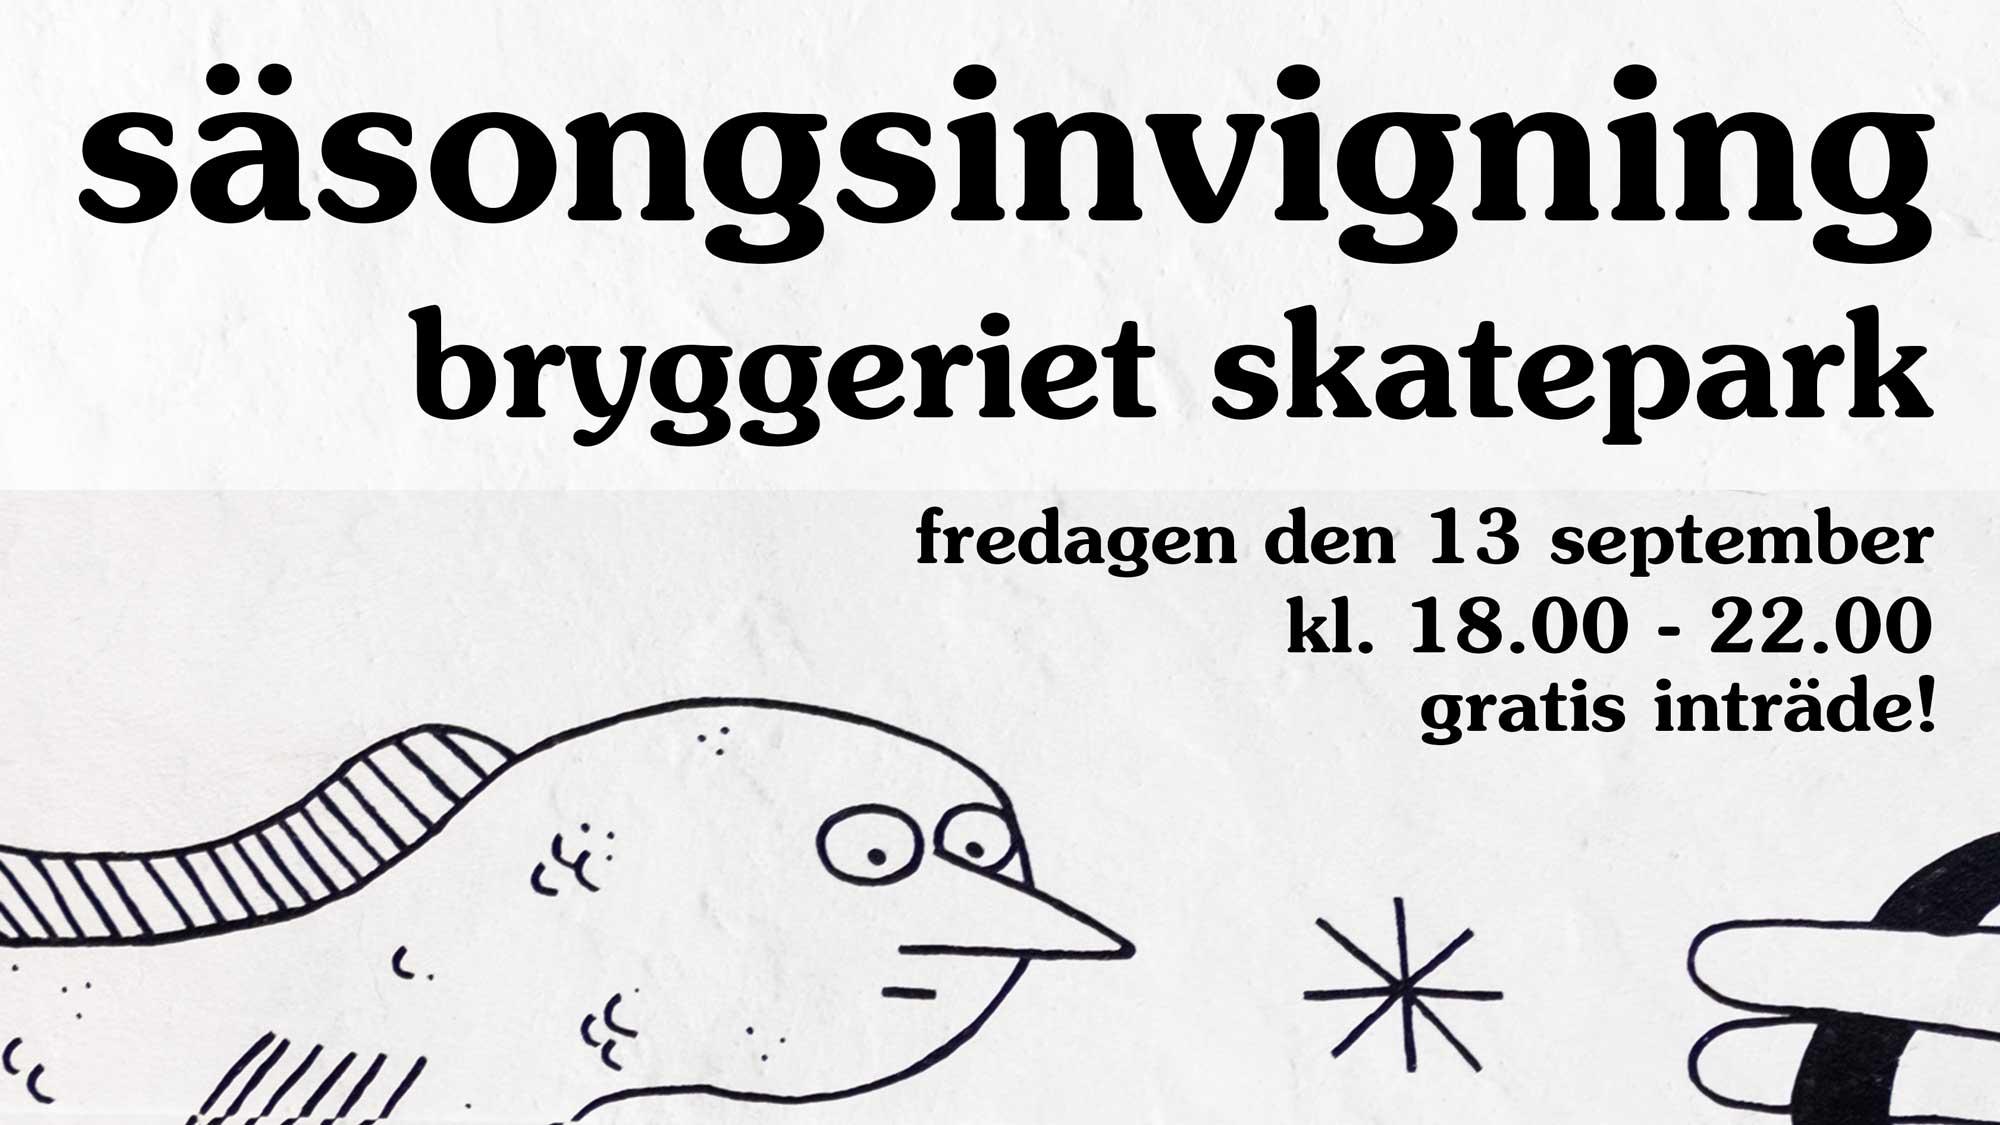 Invigning-bryggeriet-2019_banner